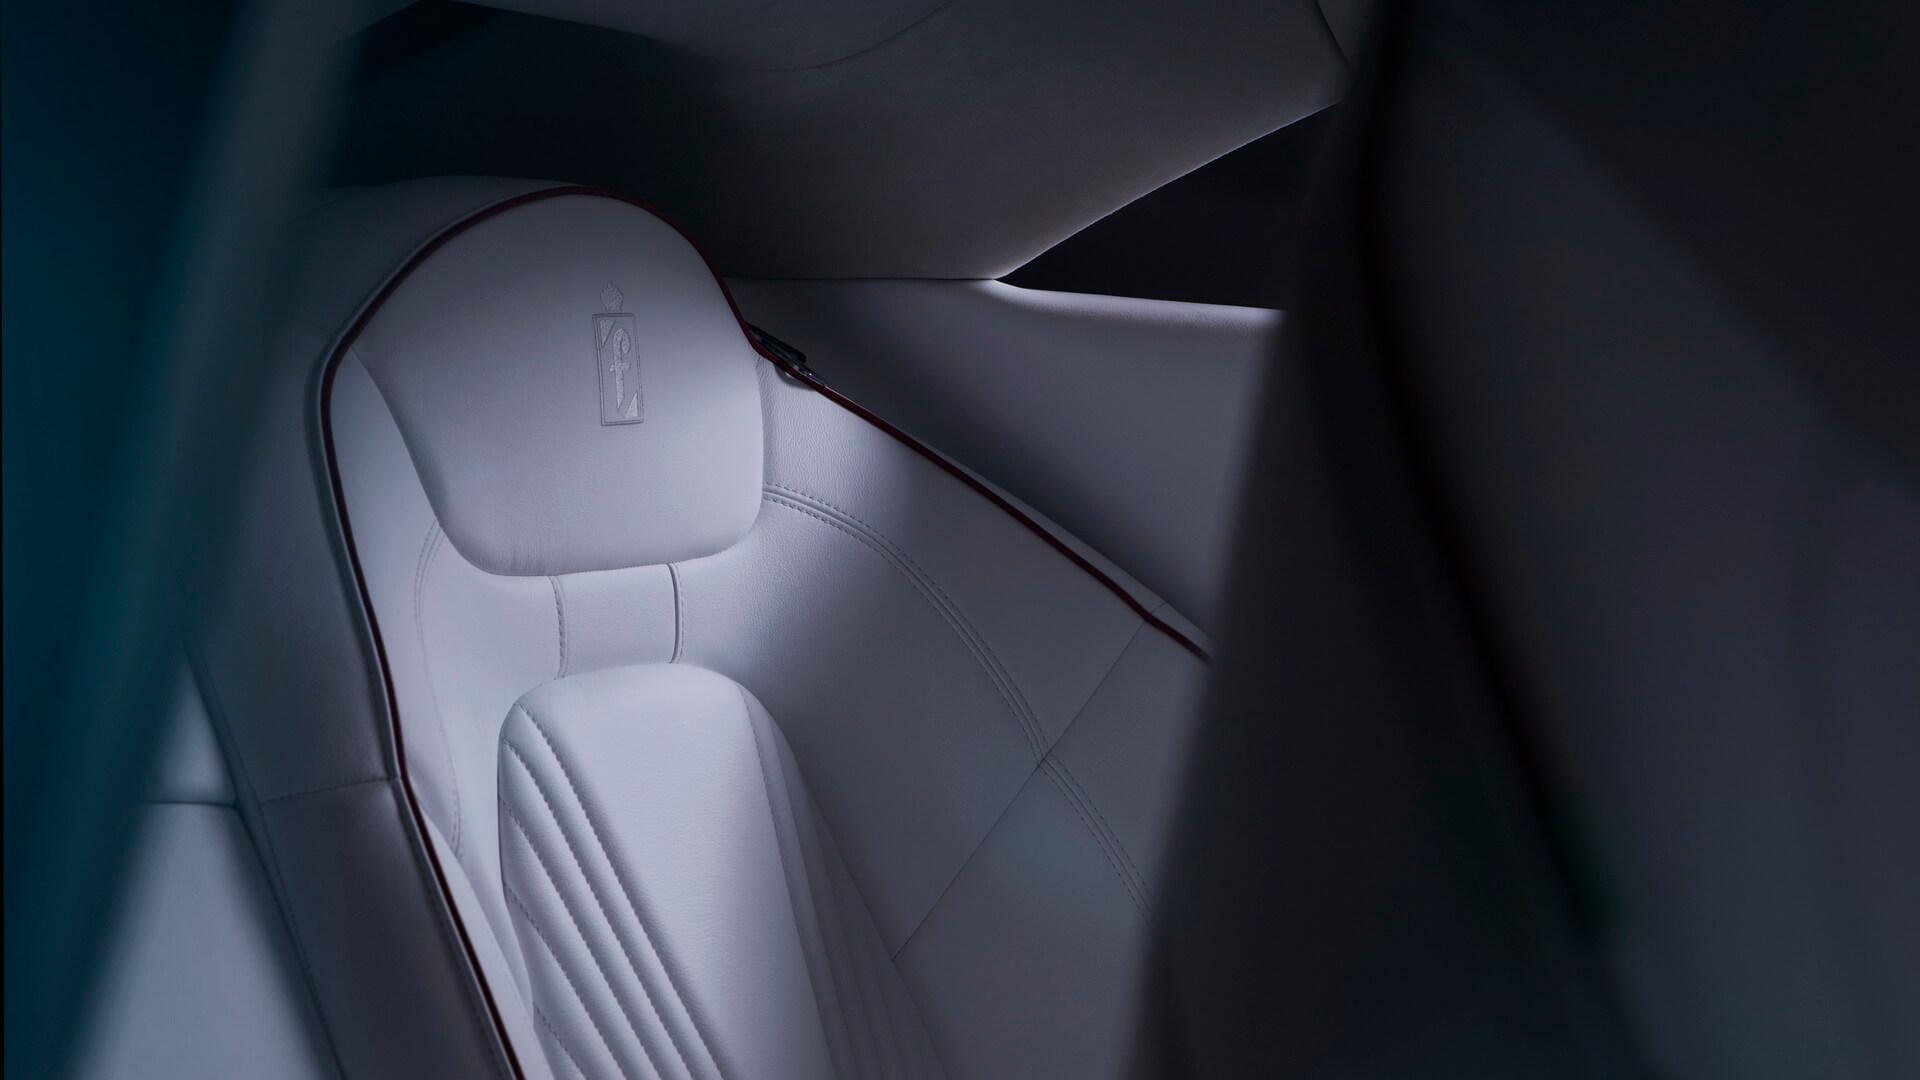 Сиденье плагин-гибрида Karma Pininfarina GT